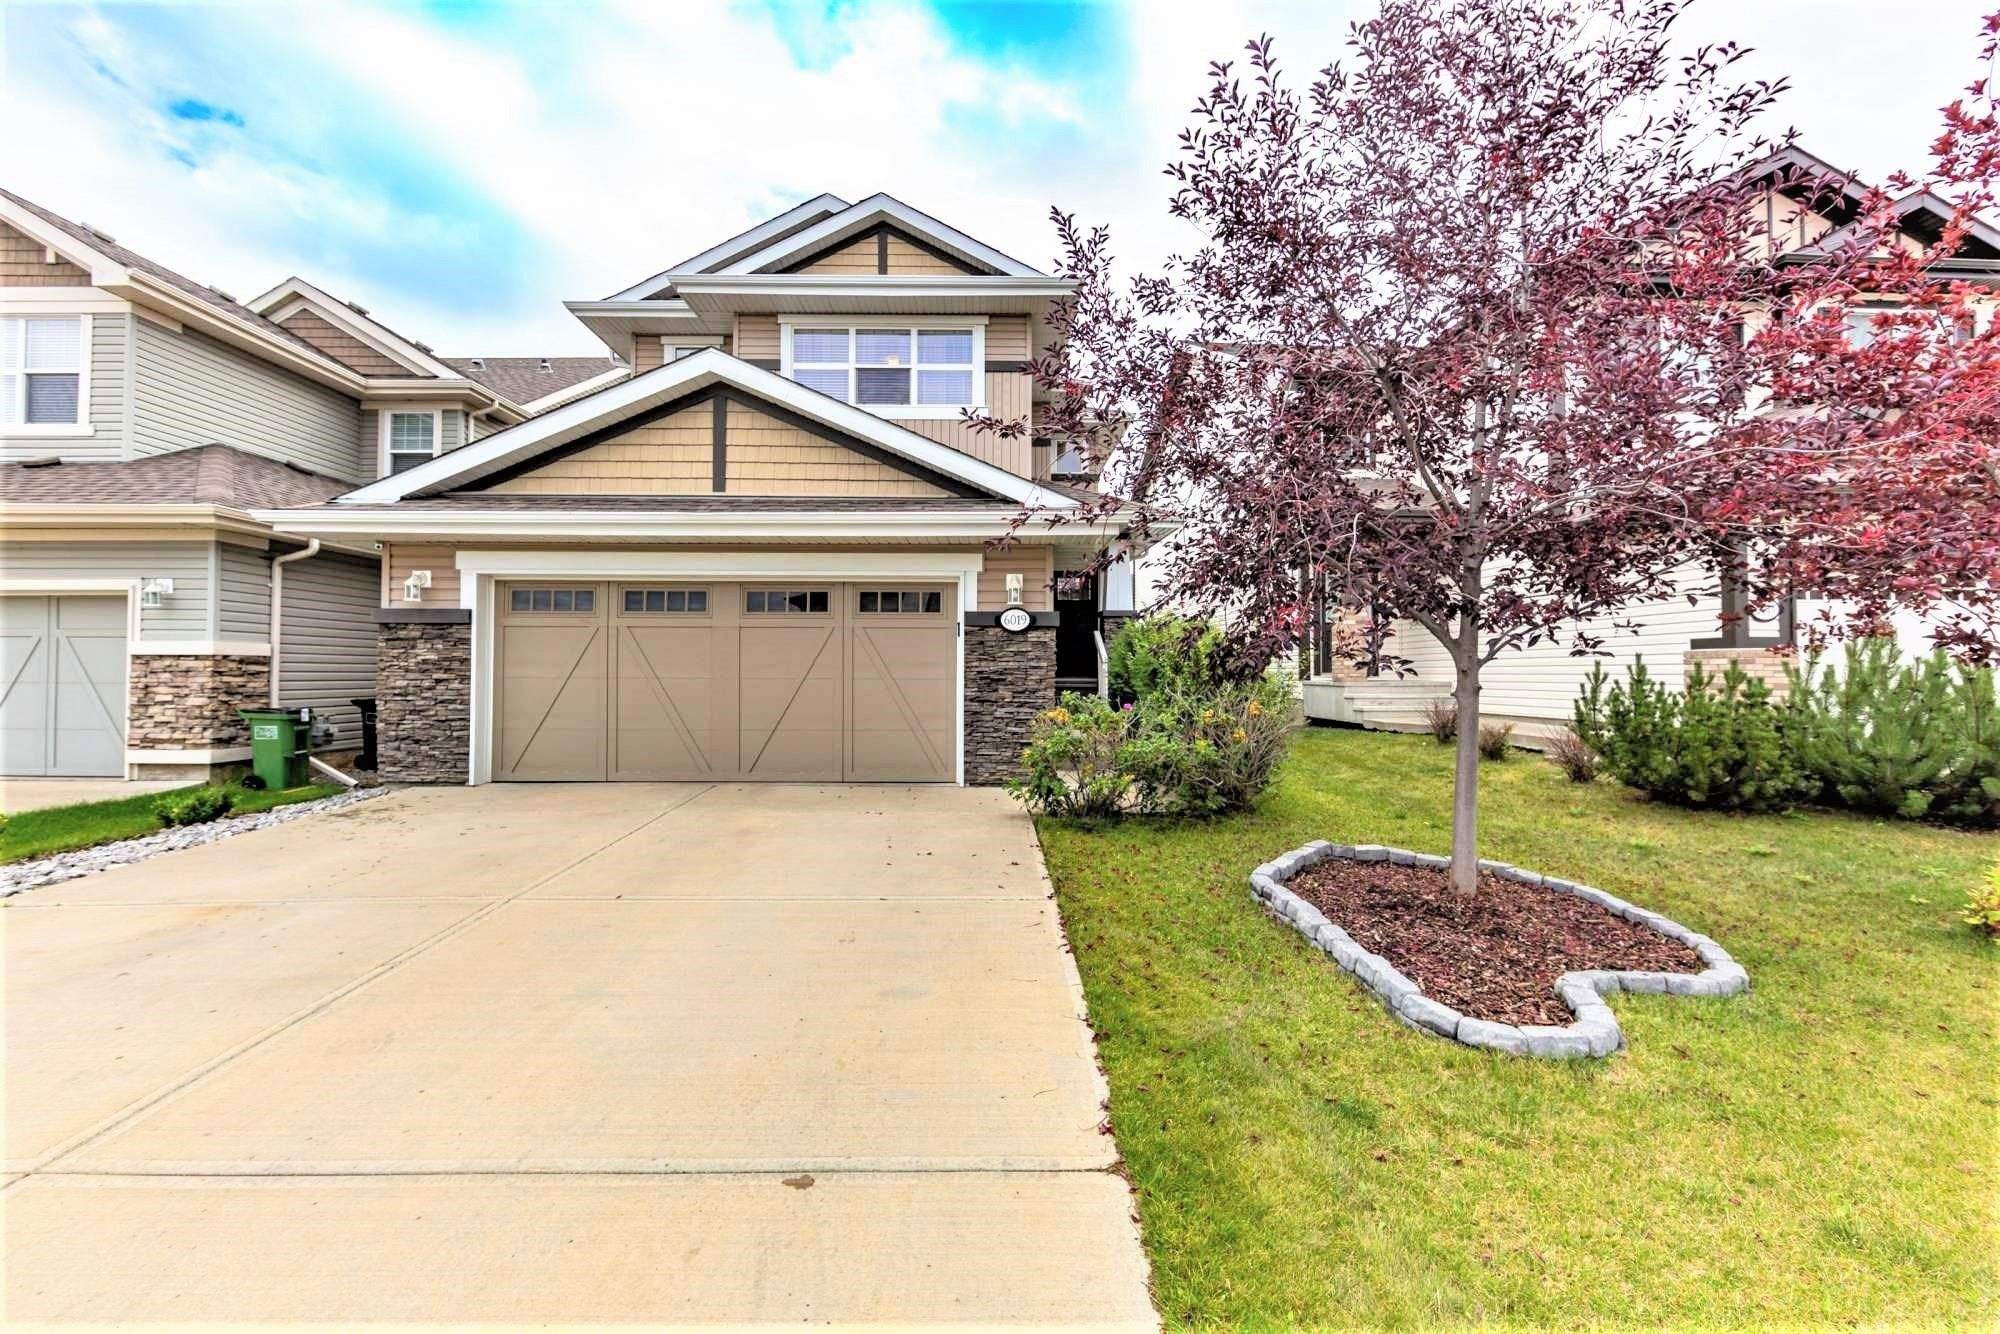 Main Photo: 6019 208 Street in Edmonton: Zone 58 House for sale : MLS®# E4262704